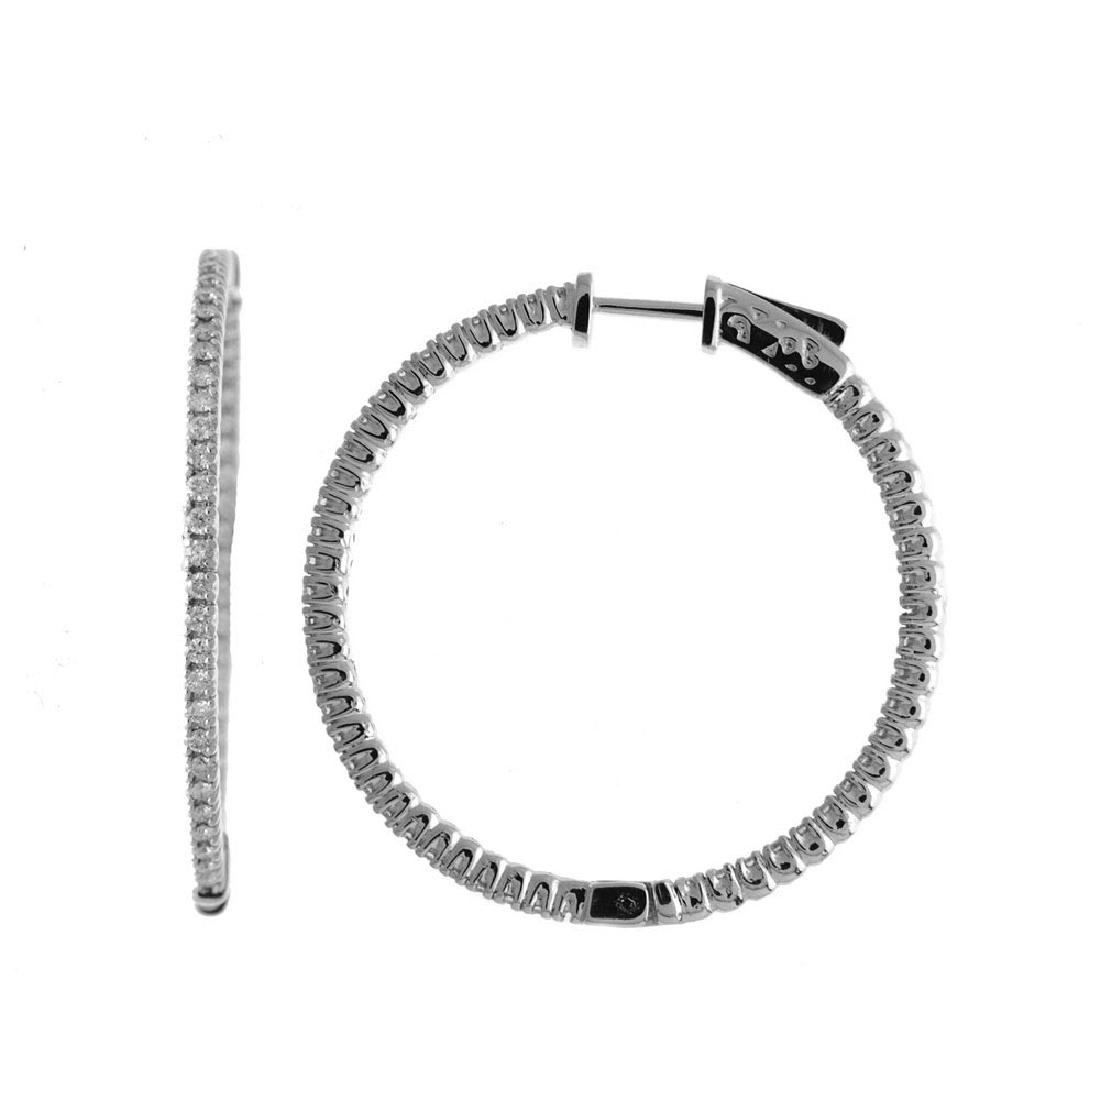 Certified 14K 1ct White Gold Diamond Secure Lock 35 mm